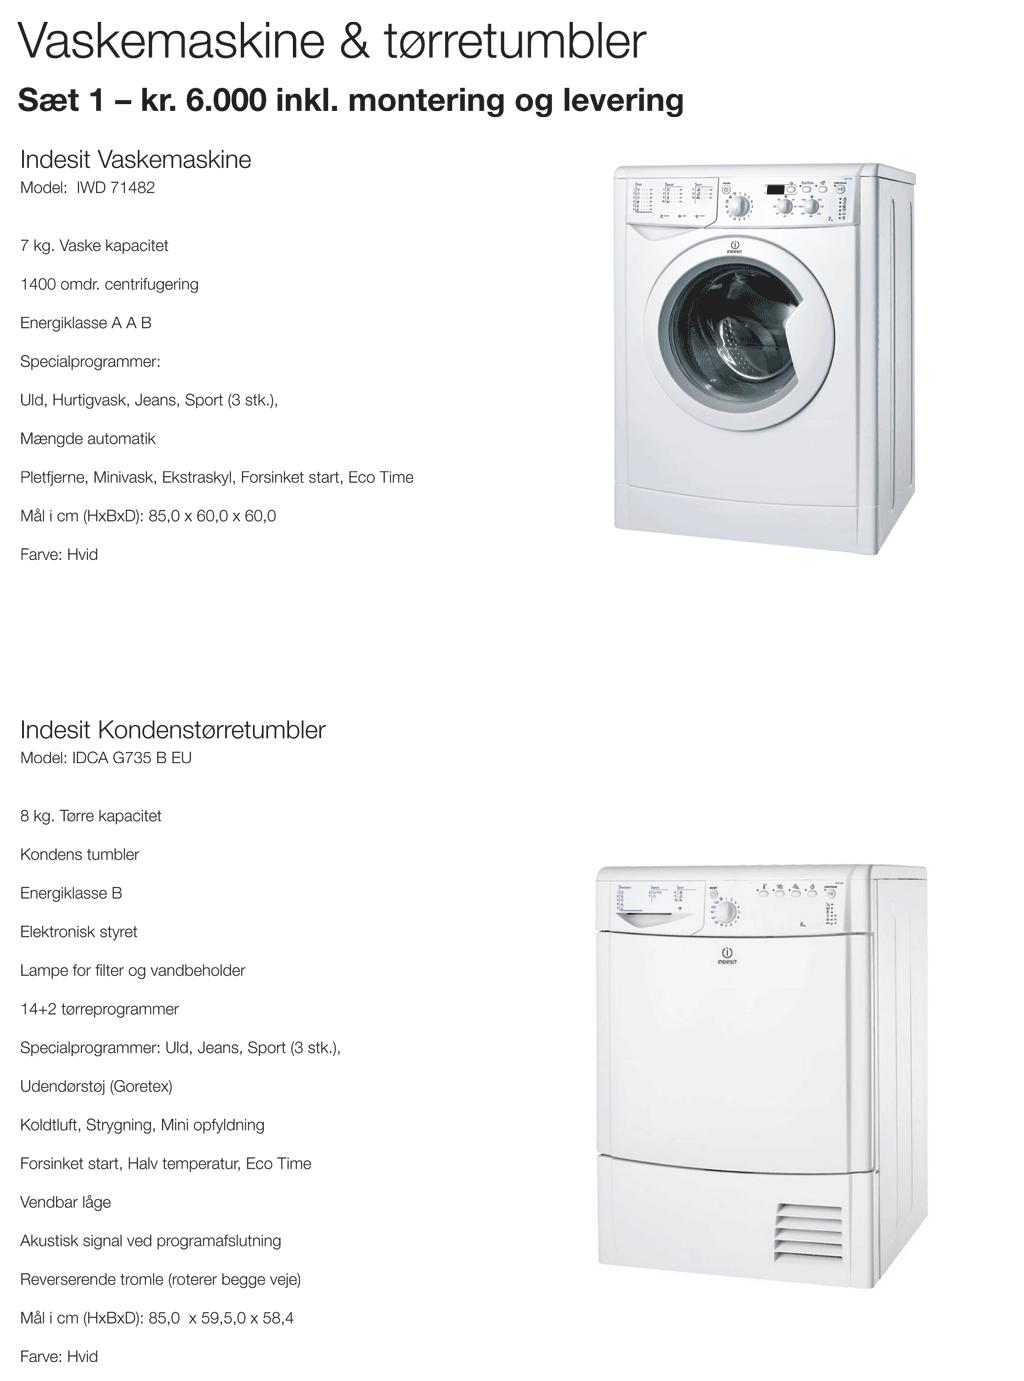 vaskemaskine tørretumbler tilbud